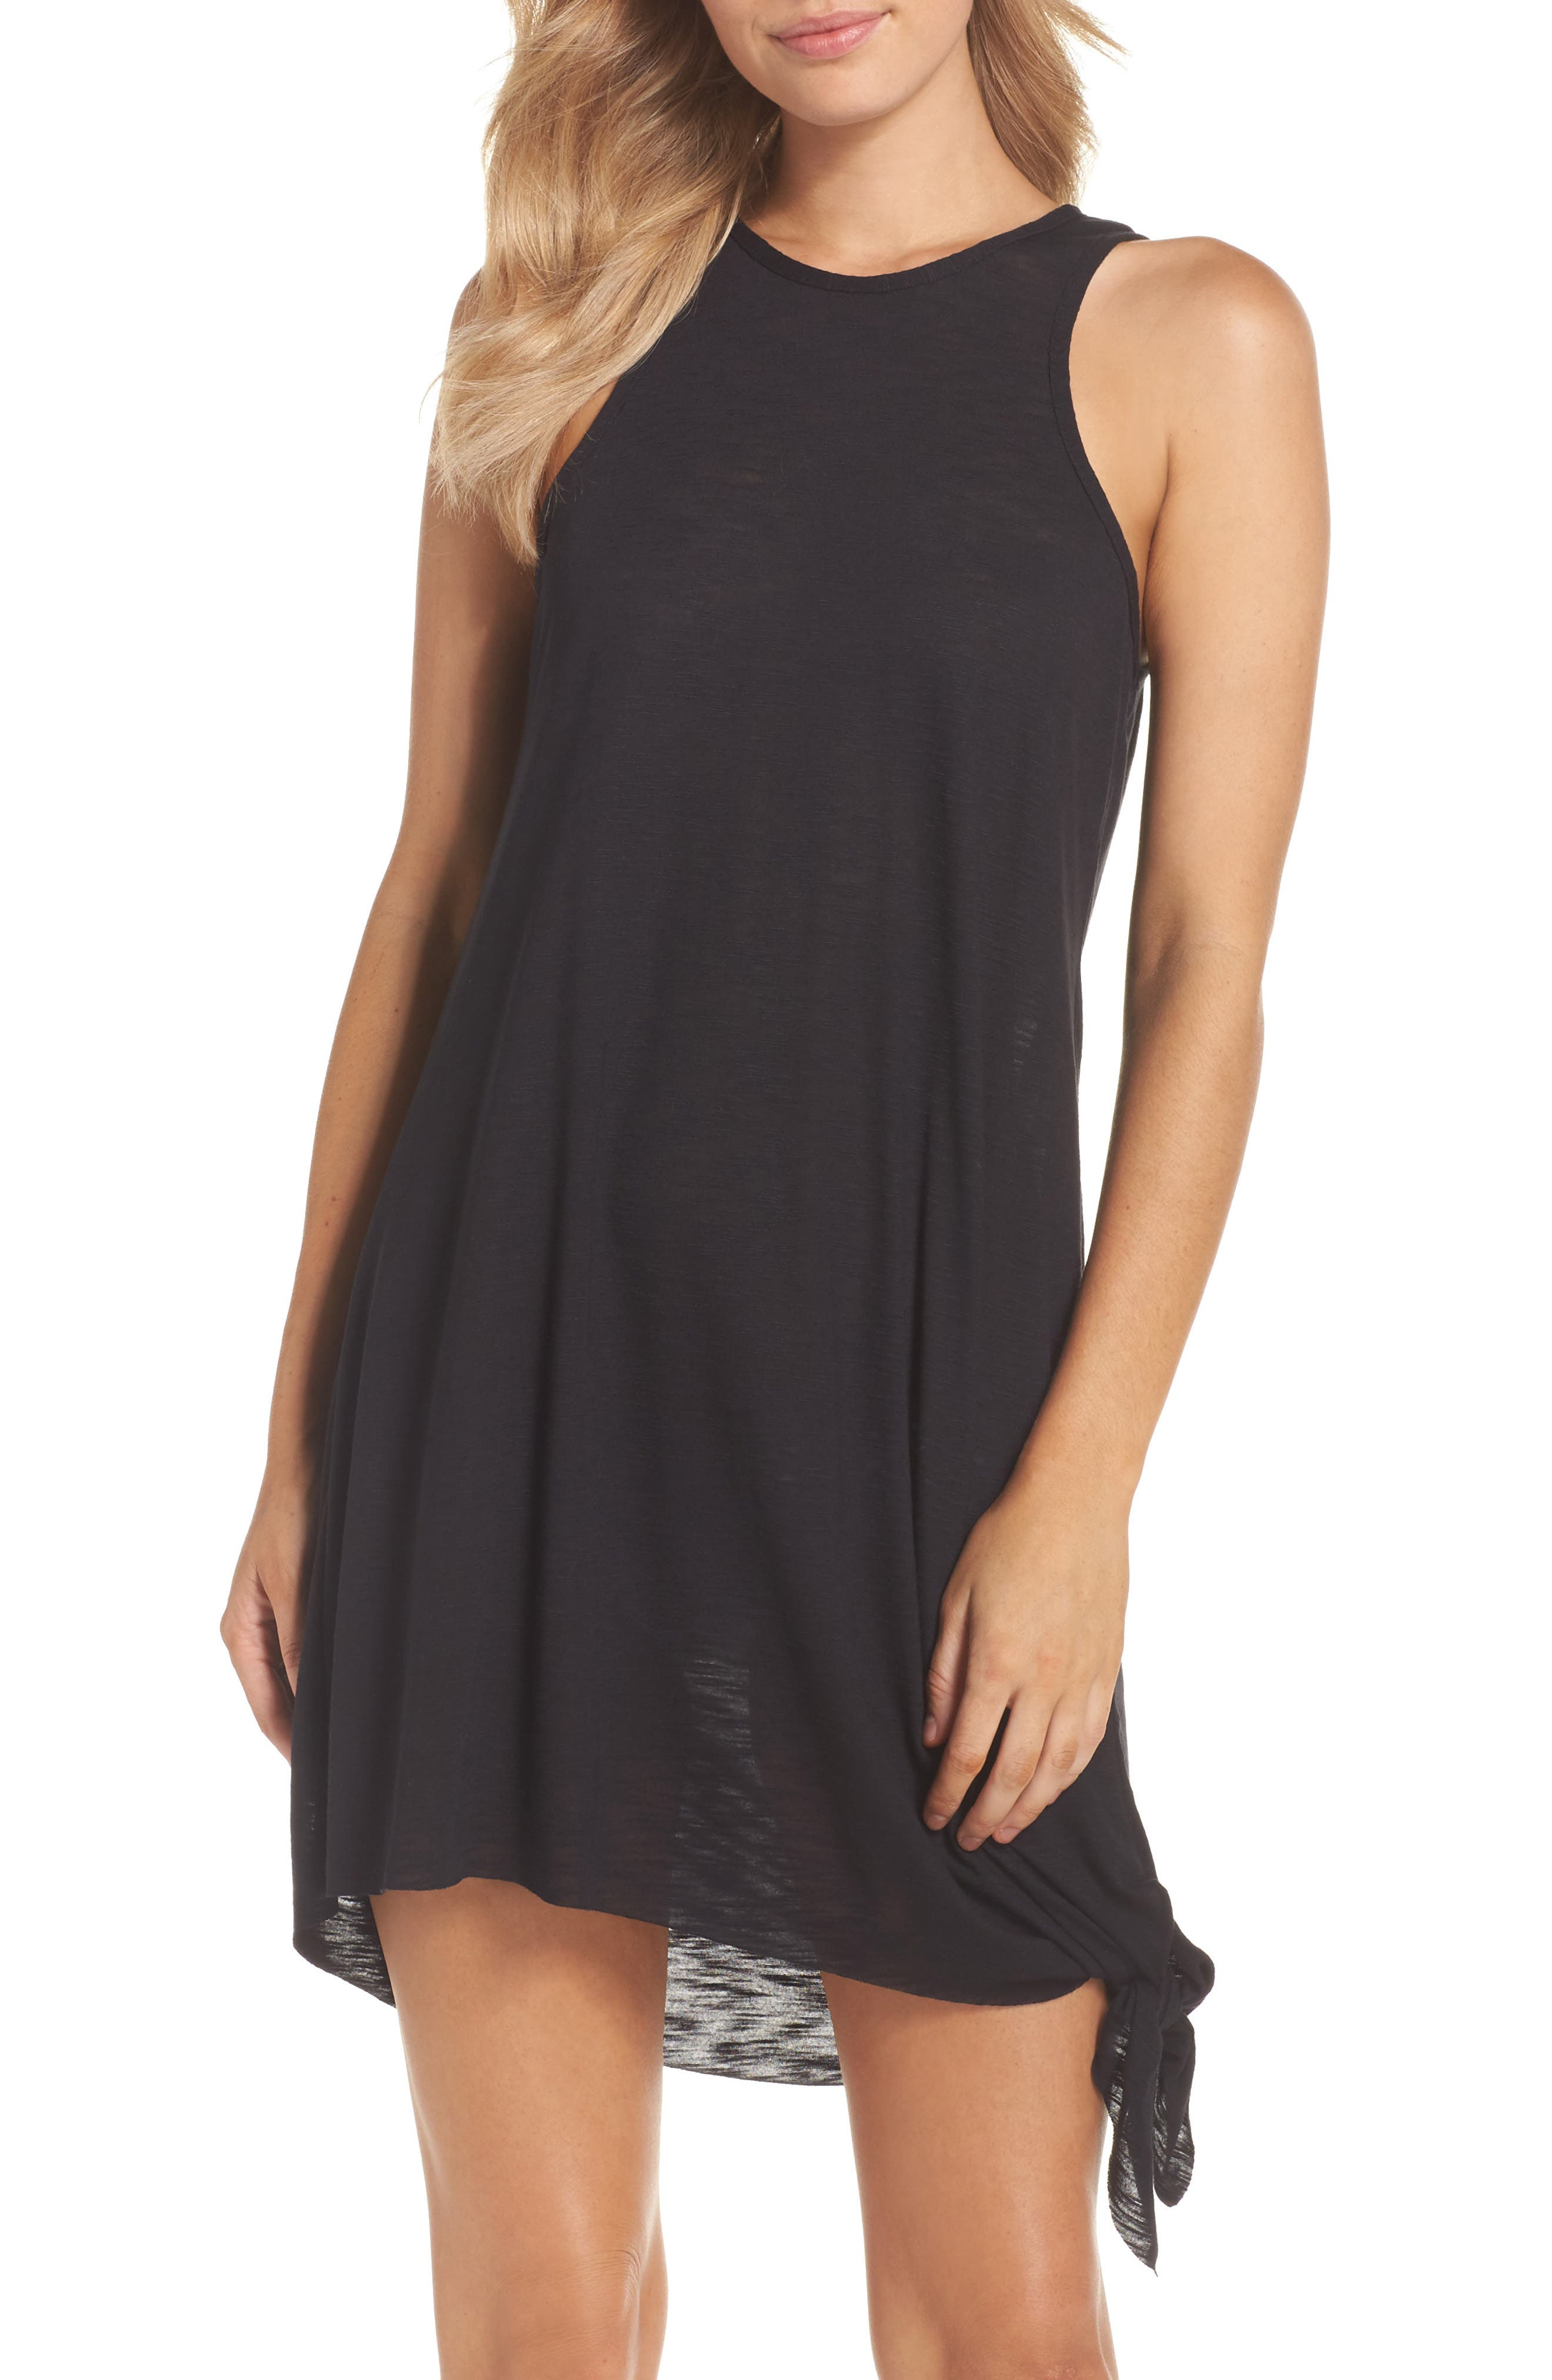 BECCA, Breezy Basics Cover-Up Dress, Main thumbnail 1, color, BLACK